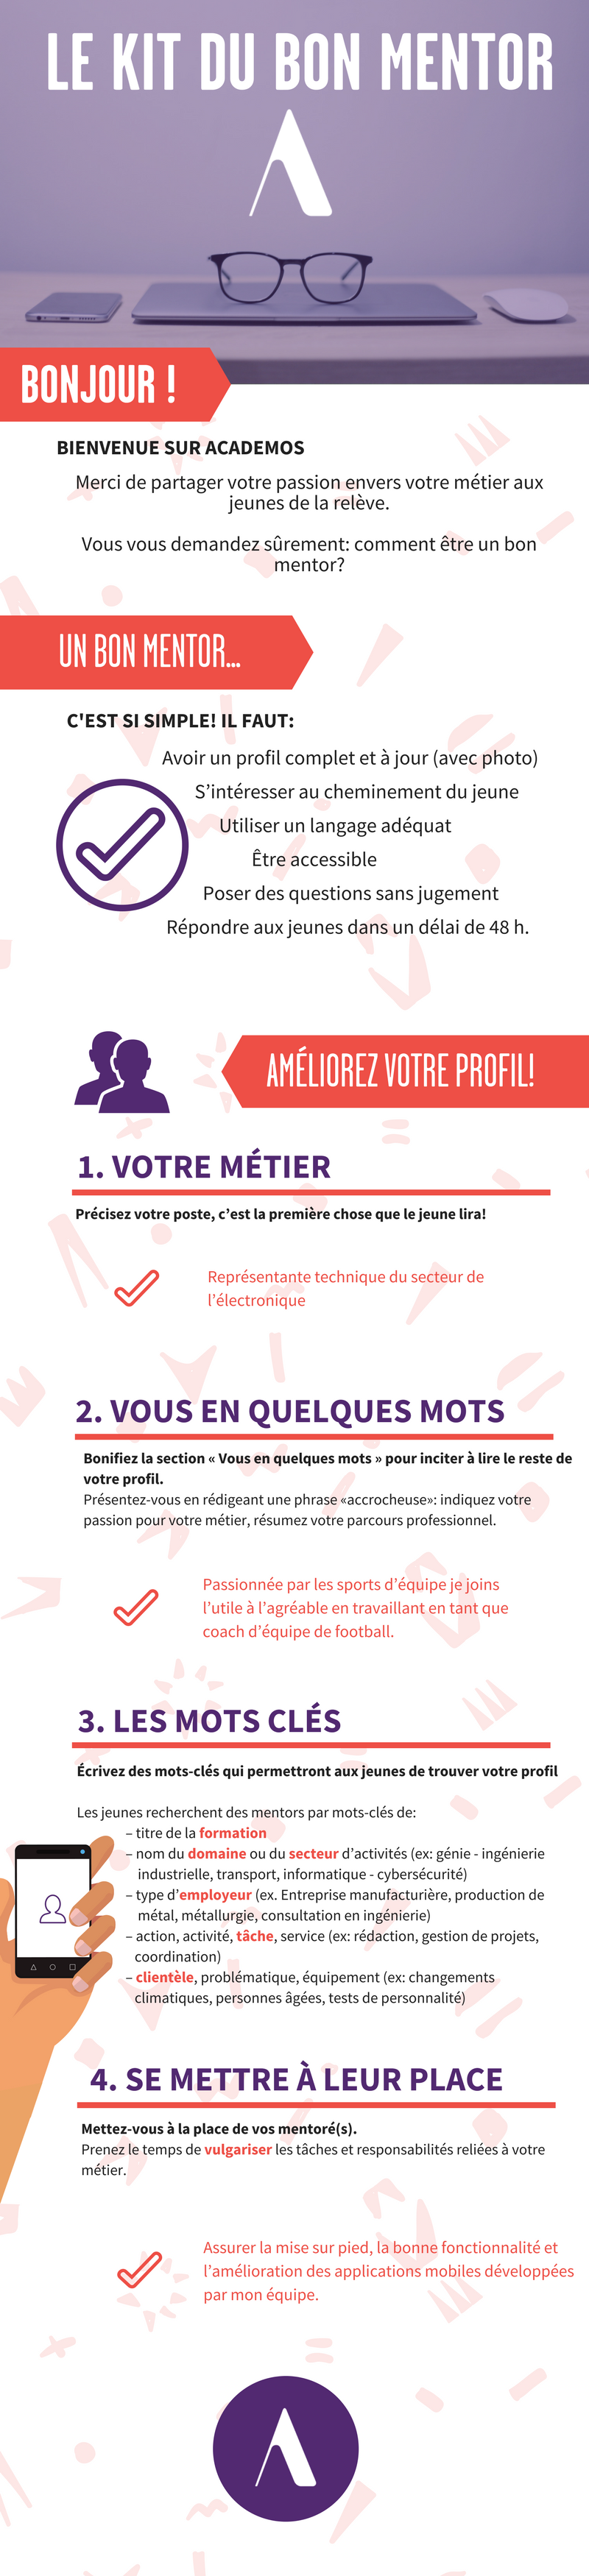 Kit du bon mentor 1 - Academos